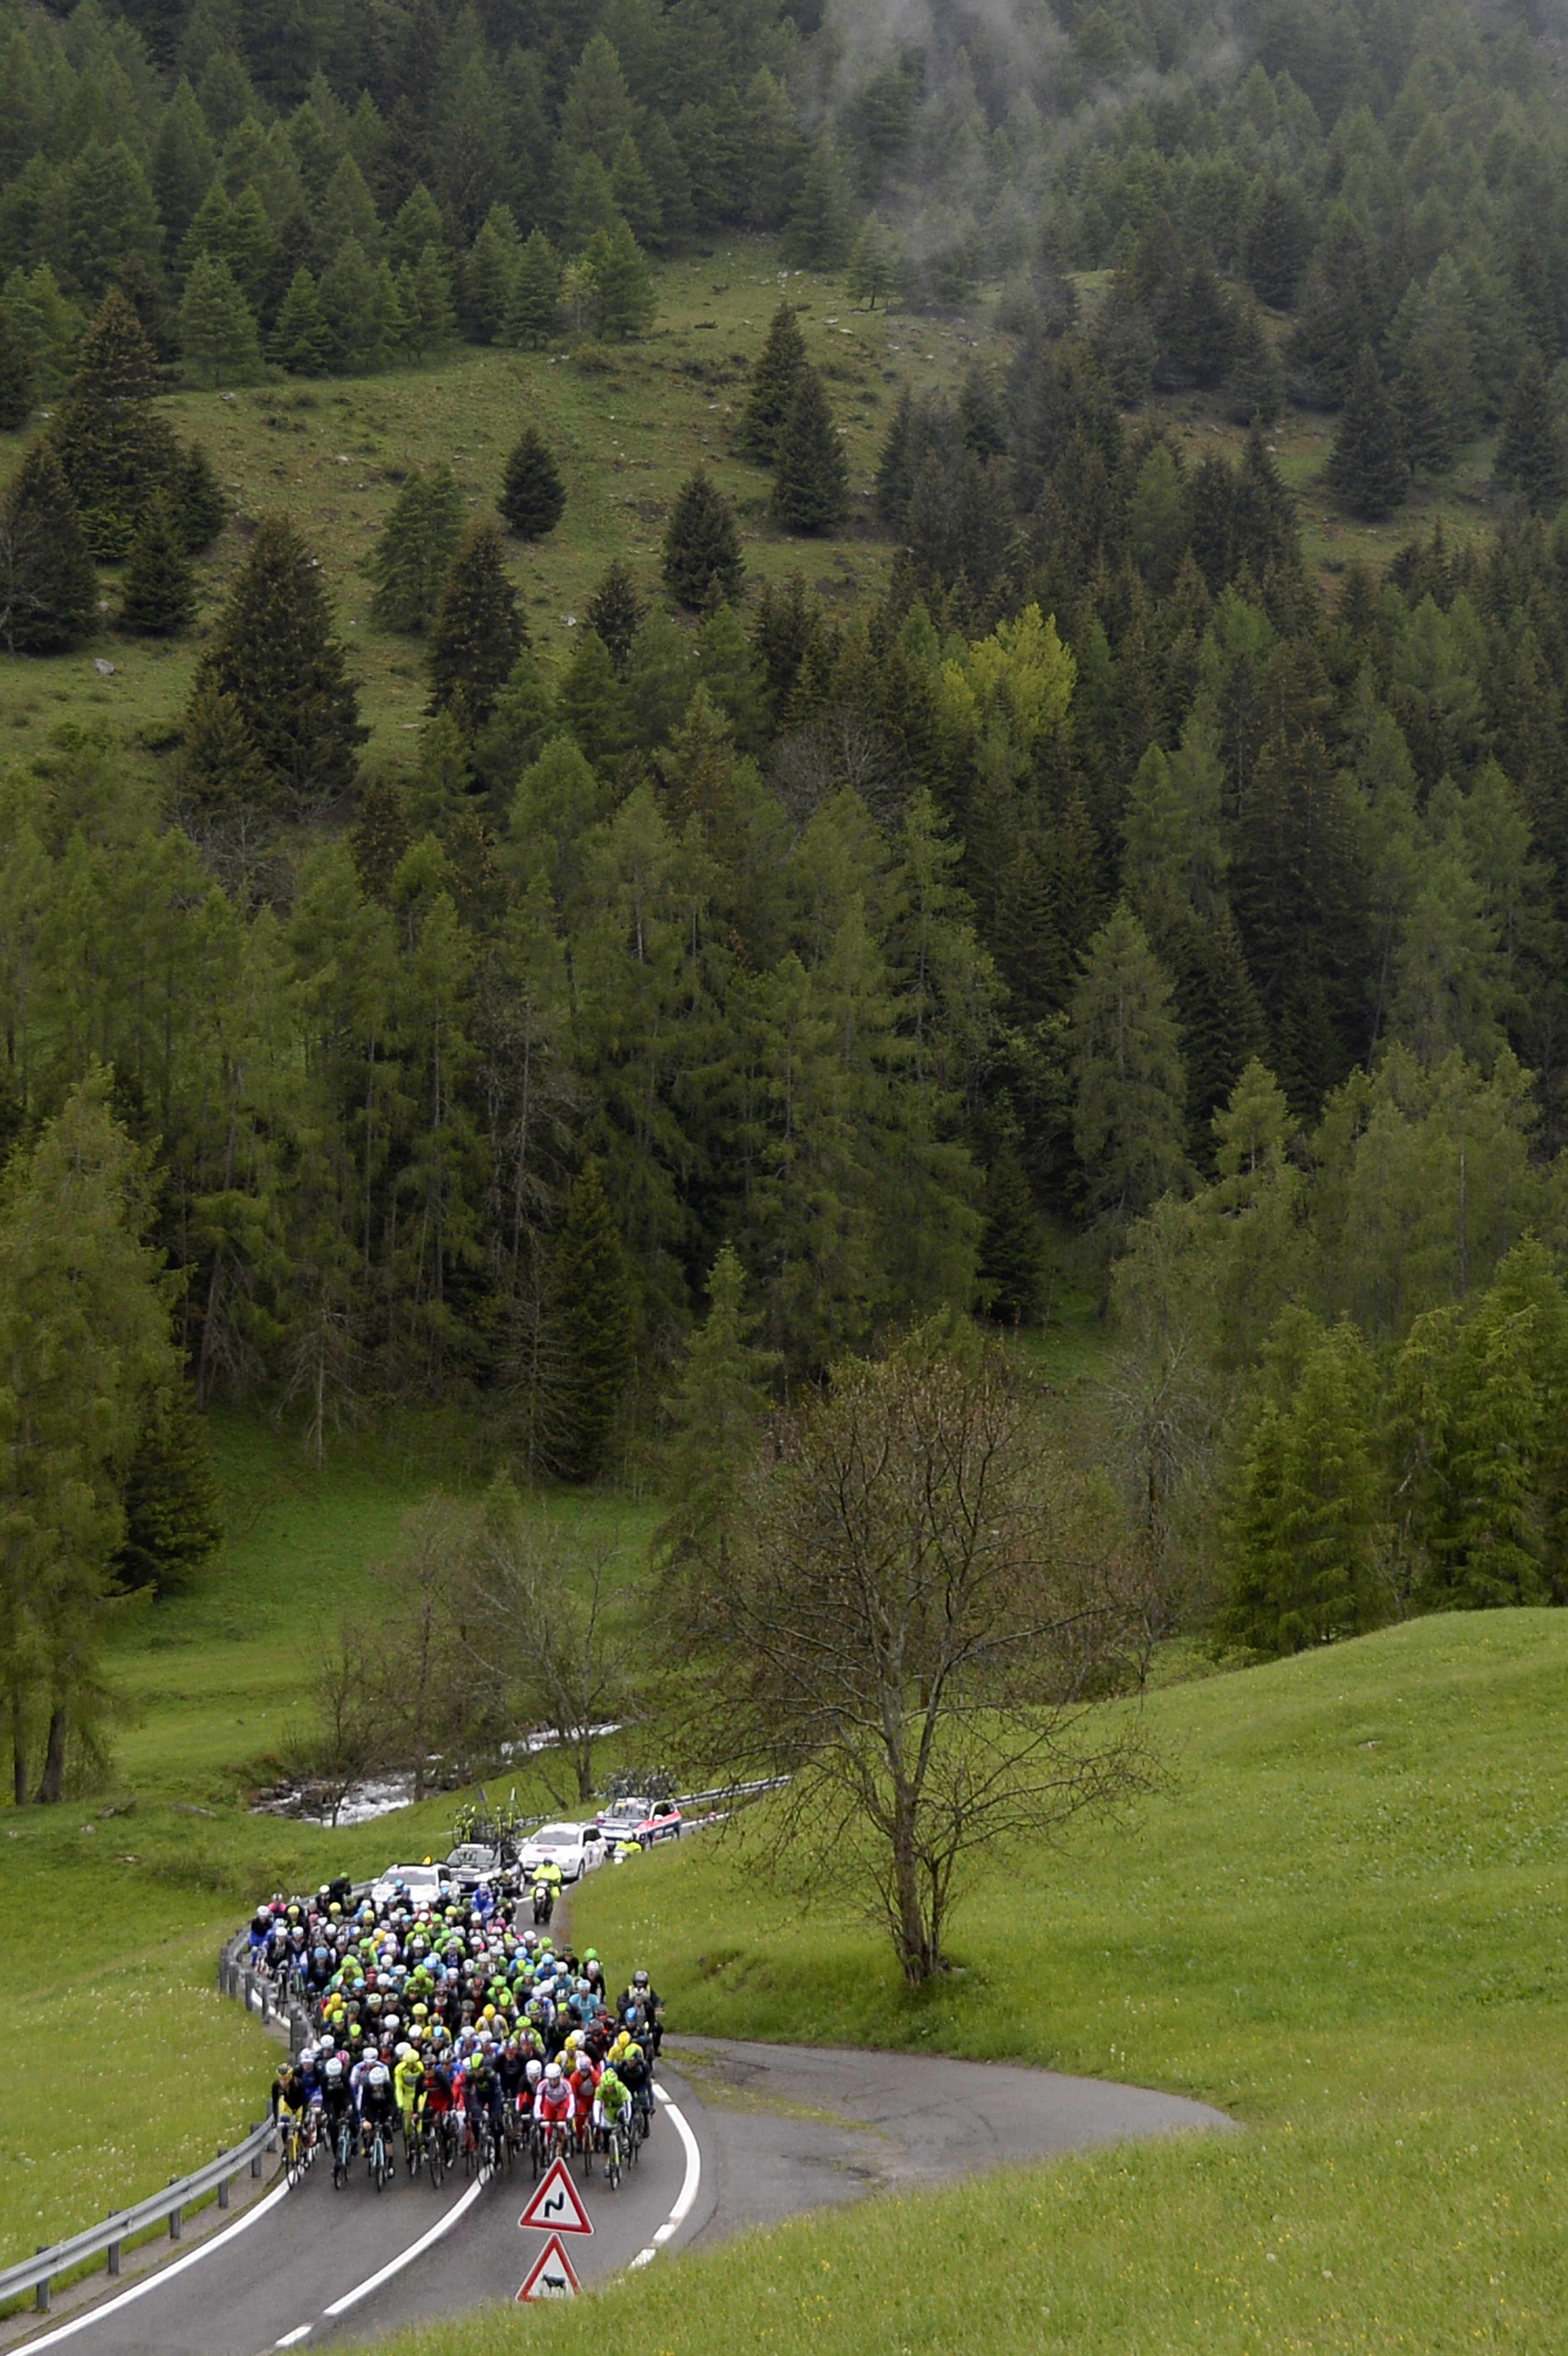 Giro d'Italia 2014 – Tappa 16 Ponte di Legno – Val Martello #Giro #Giroditalia #Gavia #Stelvio #ValMartello #Quintana #Hesjedal #Rolland